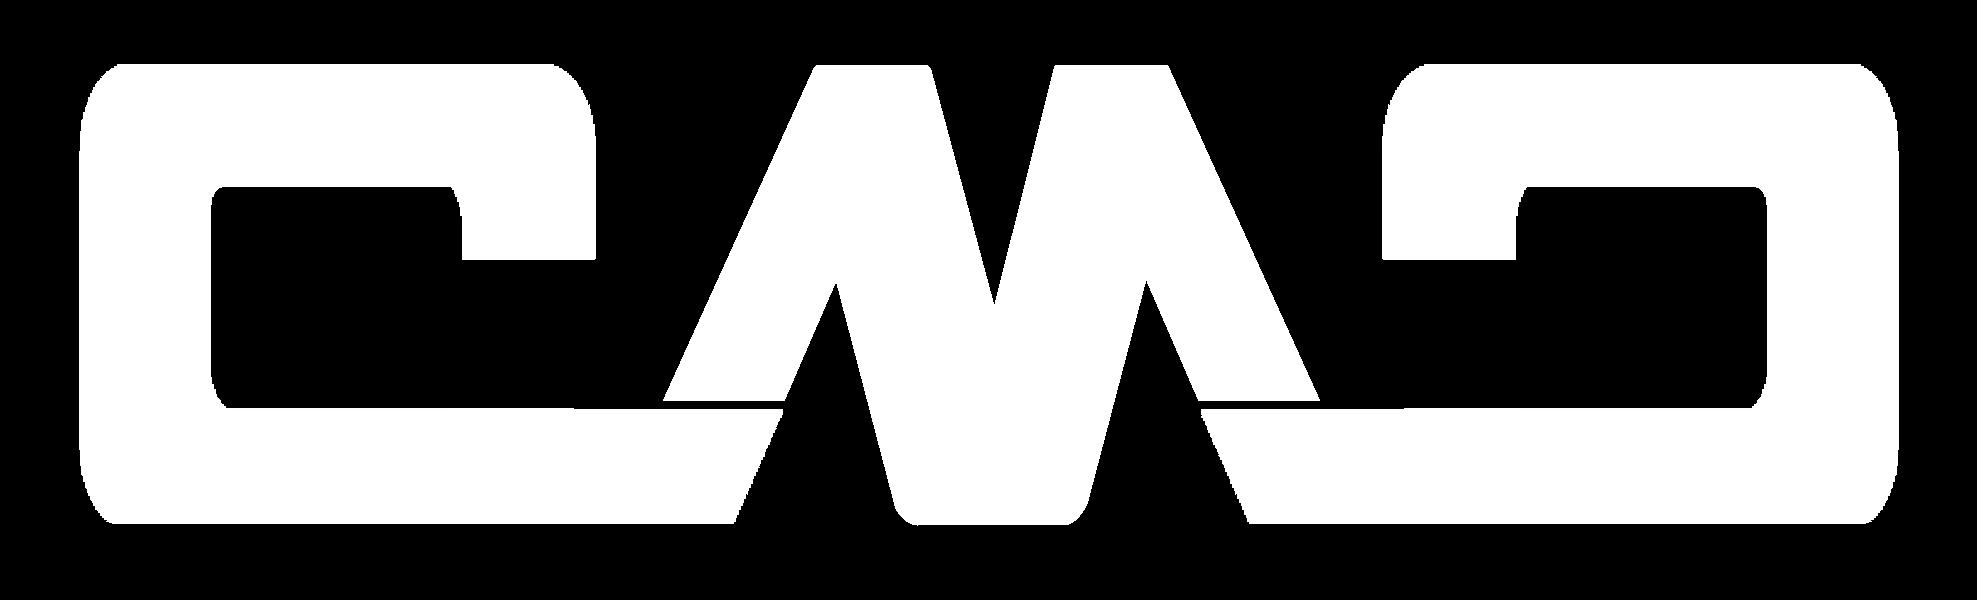 Logo Turnier CMC #3 - 2nd Sunday (Loser Bracket)